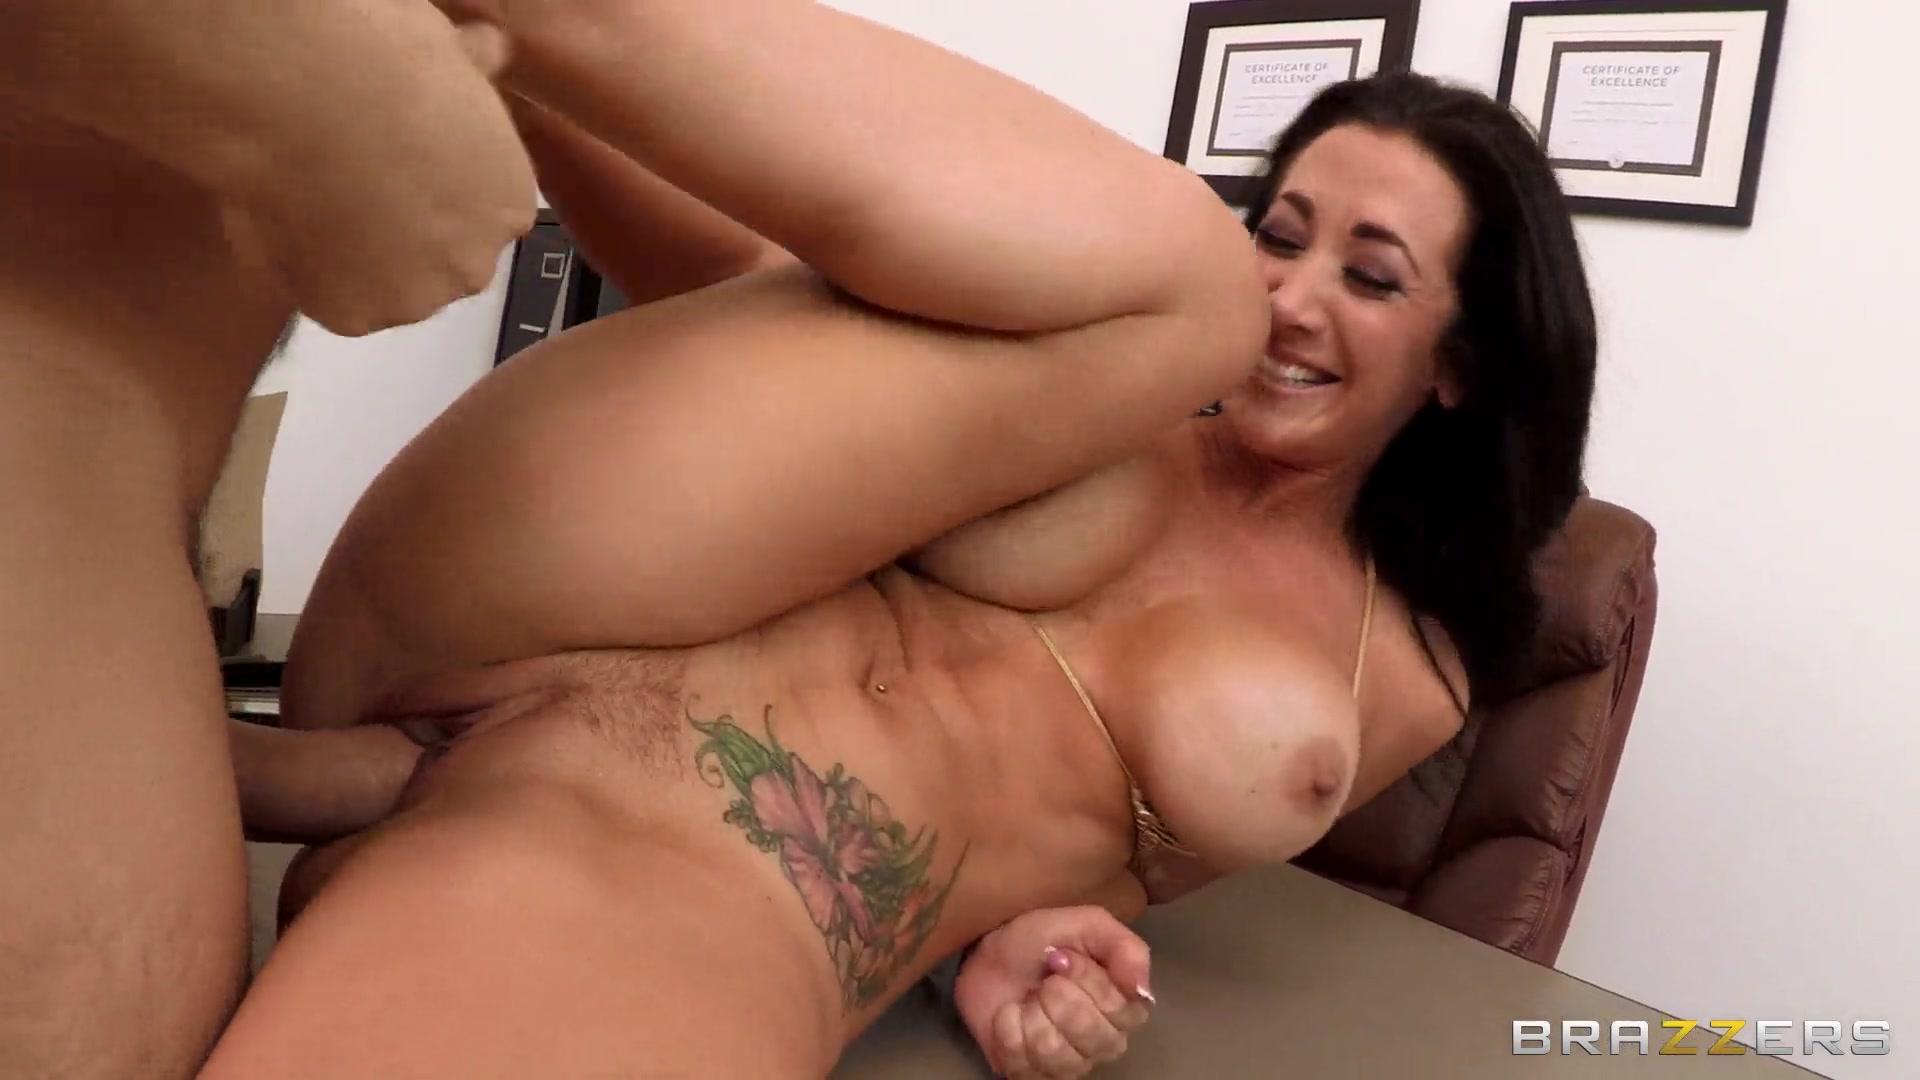 Big Tits At Work Vol 19 2013 Videos On Demand  Adult -1174